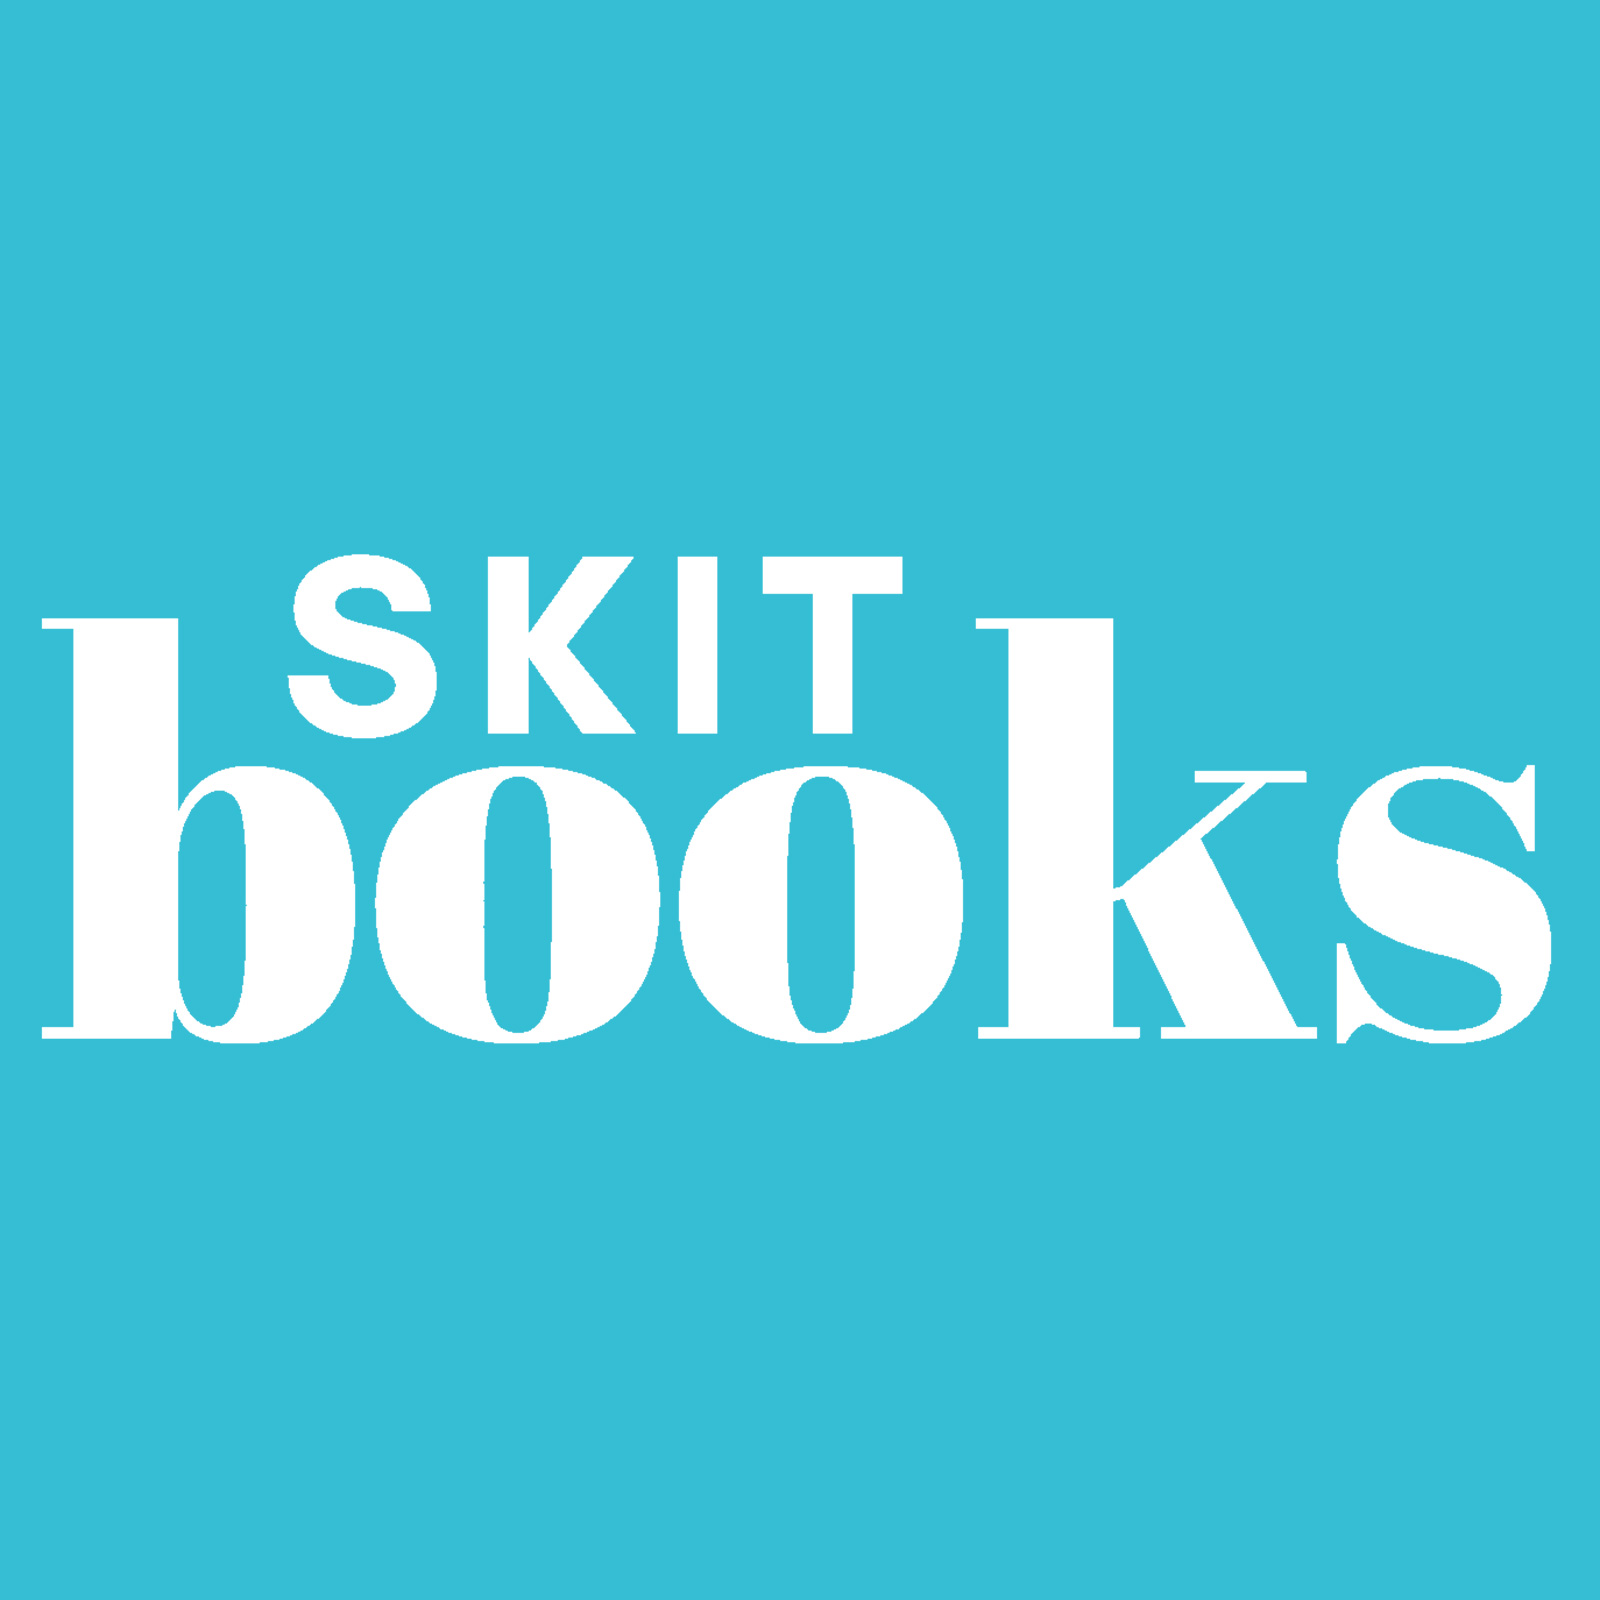 SKIT Books